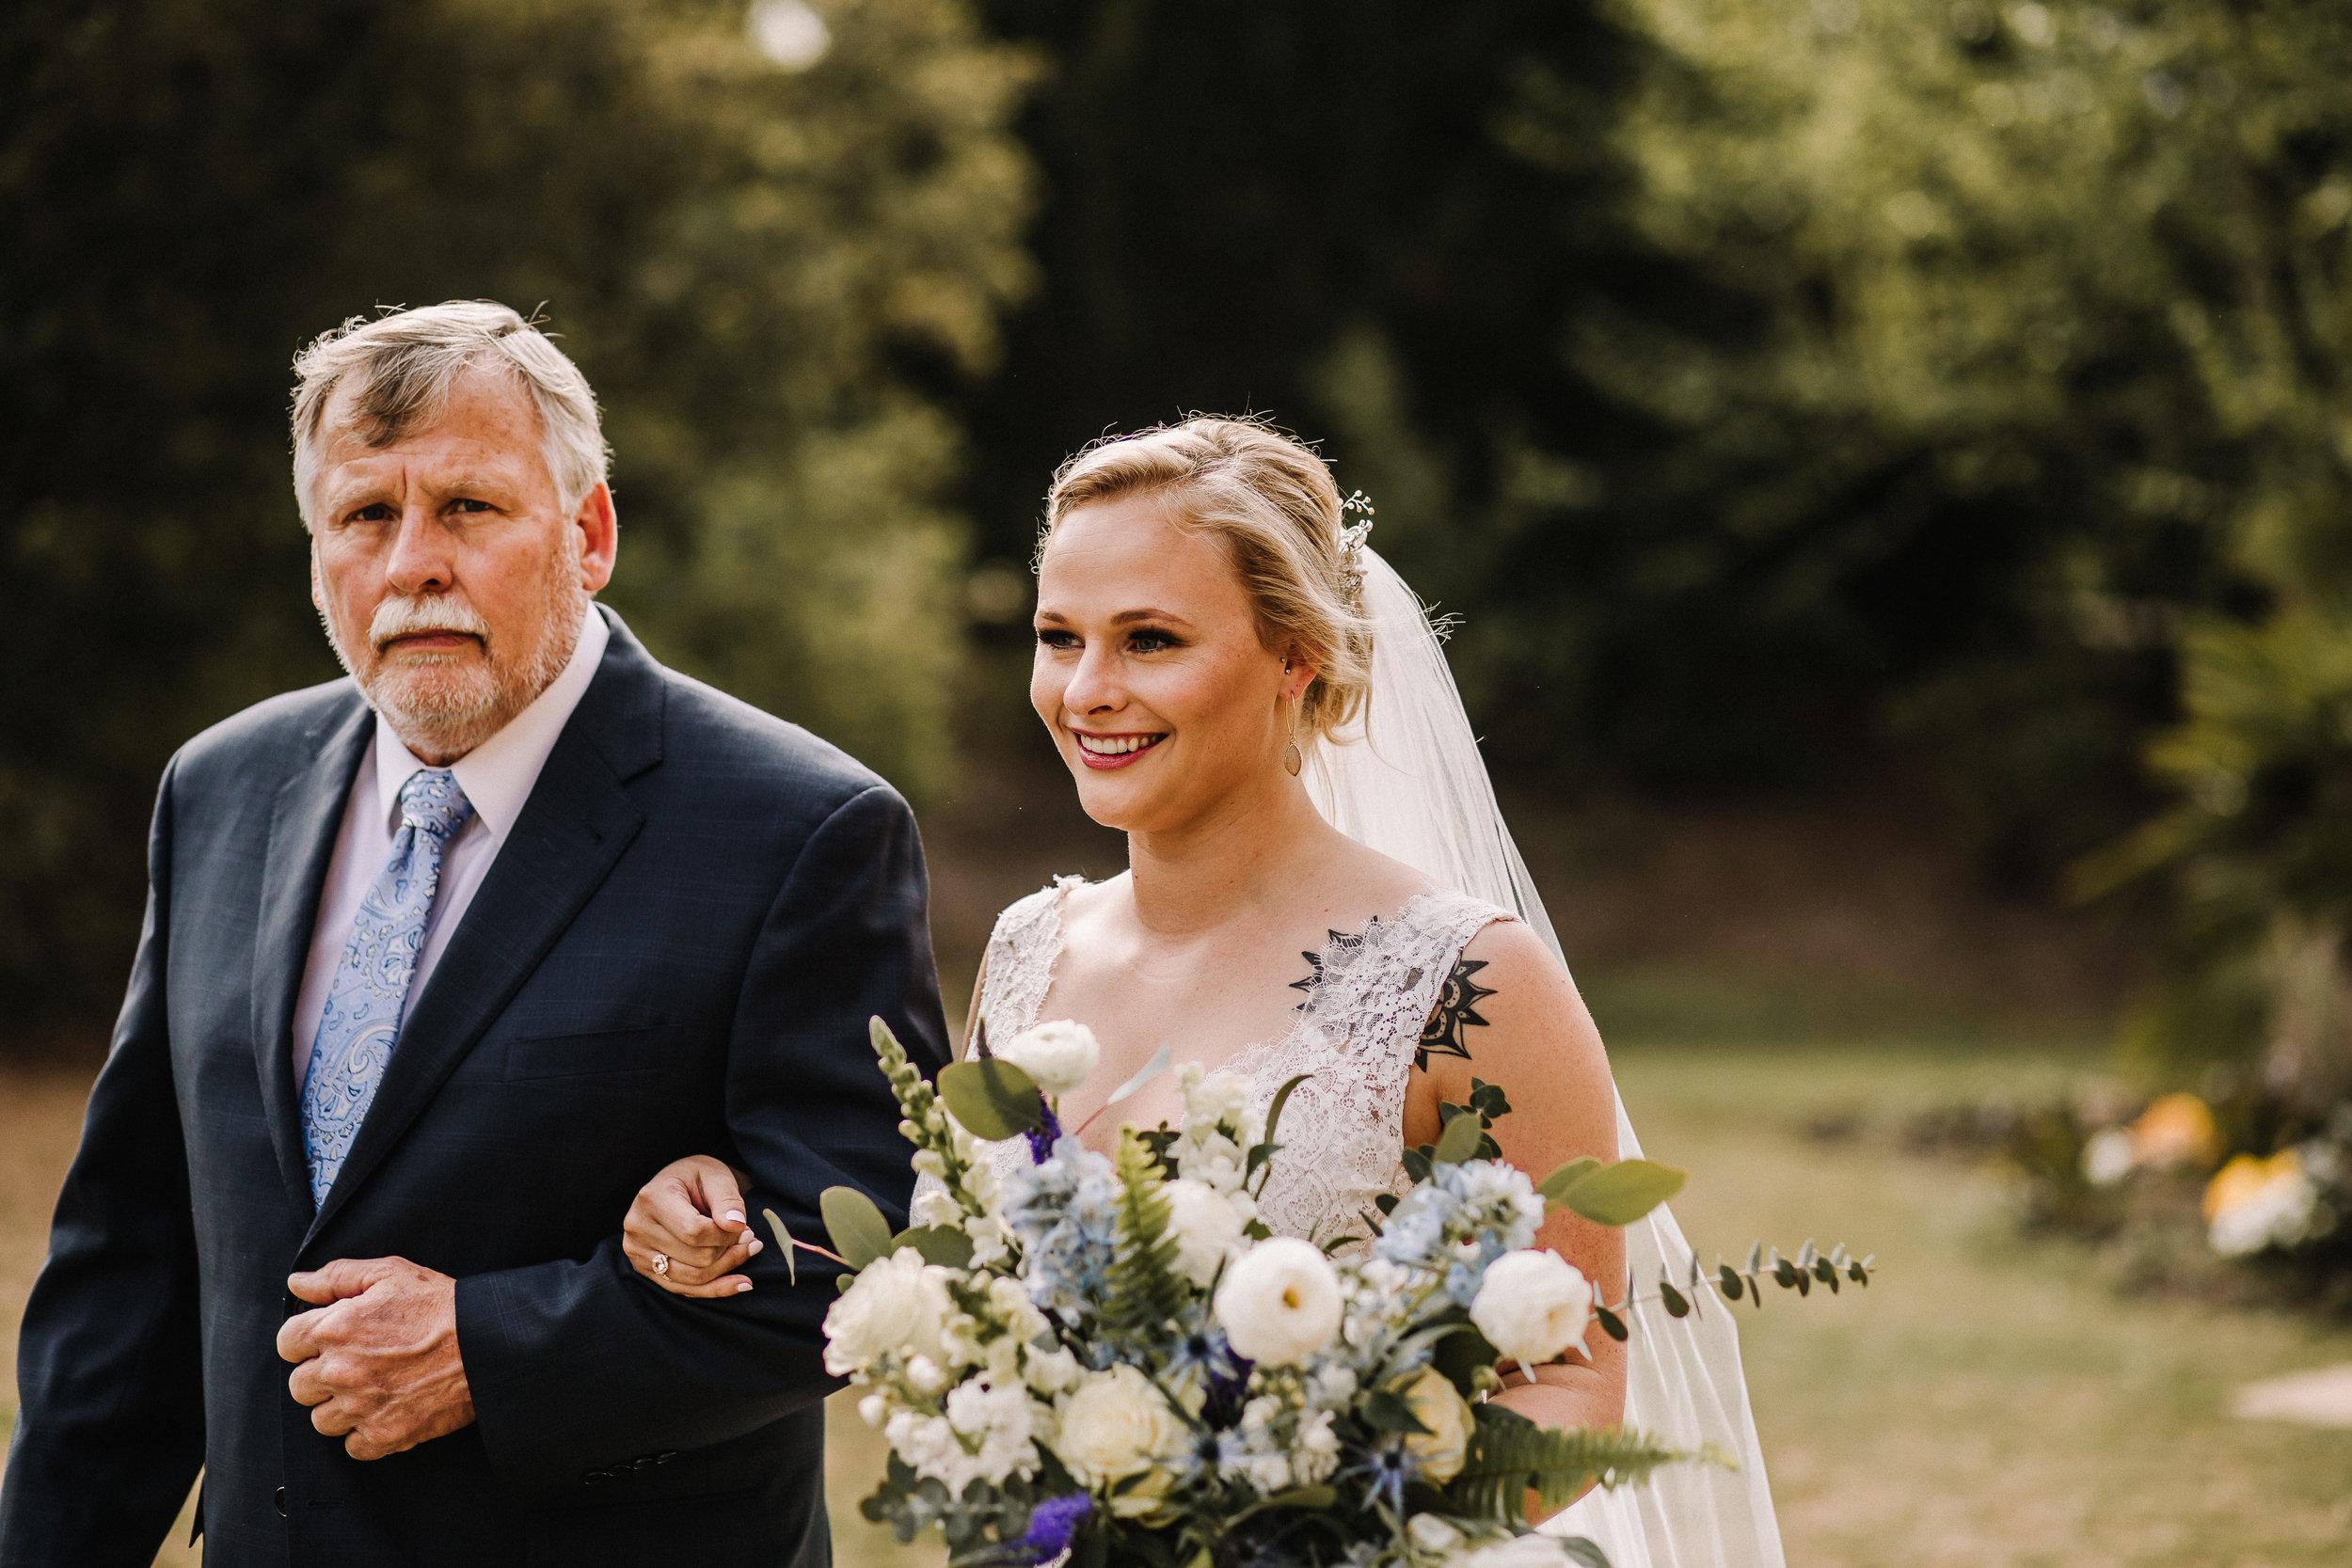 Morgan Wedding_Mill at Yellow River_Ashley Benham Photography-544.jpg